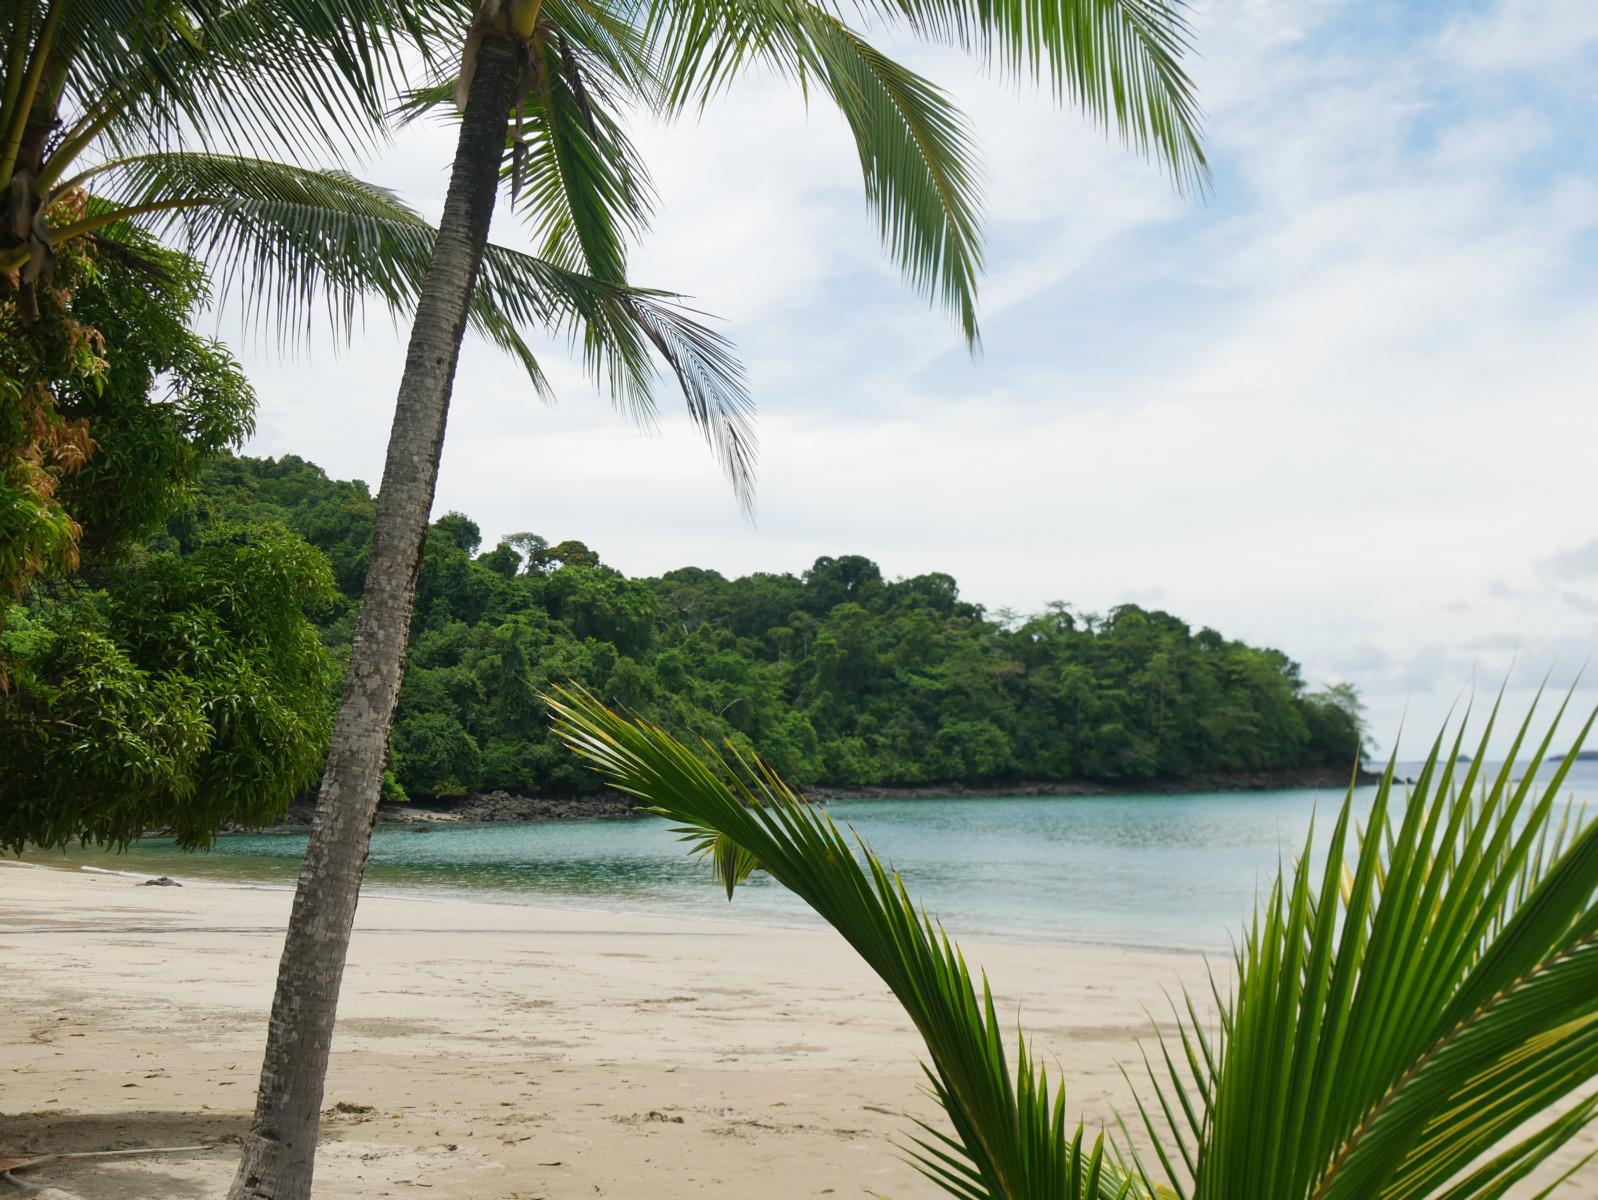 Panama Strand Insel Coiba Panama Reise